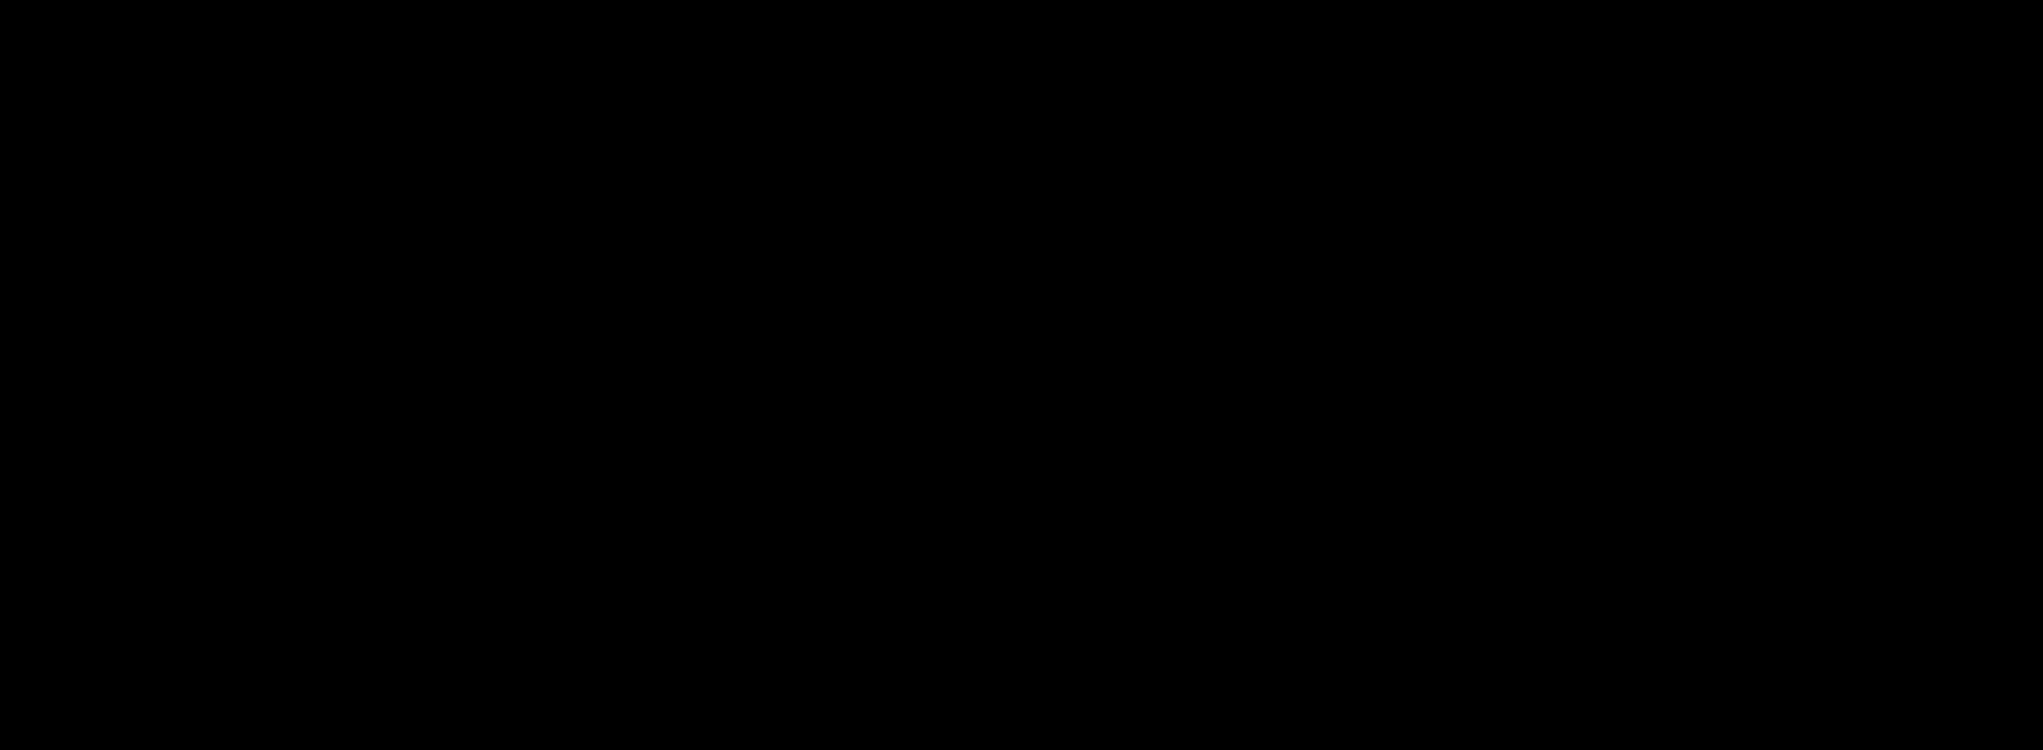 logo unix brand human behavior free commercial clipart logo unix rh kisscc0 com Unix Operating System Logo People Clip Art